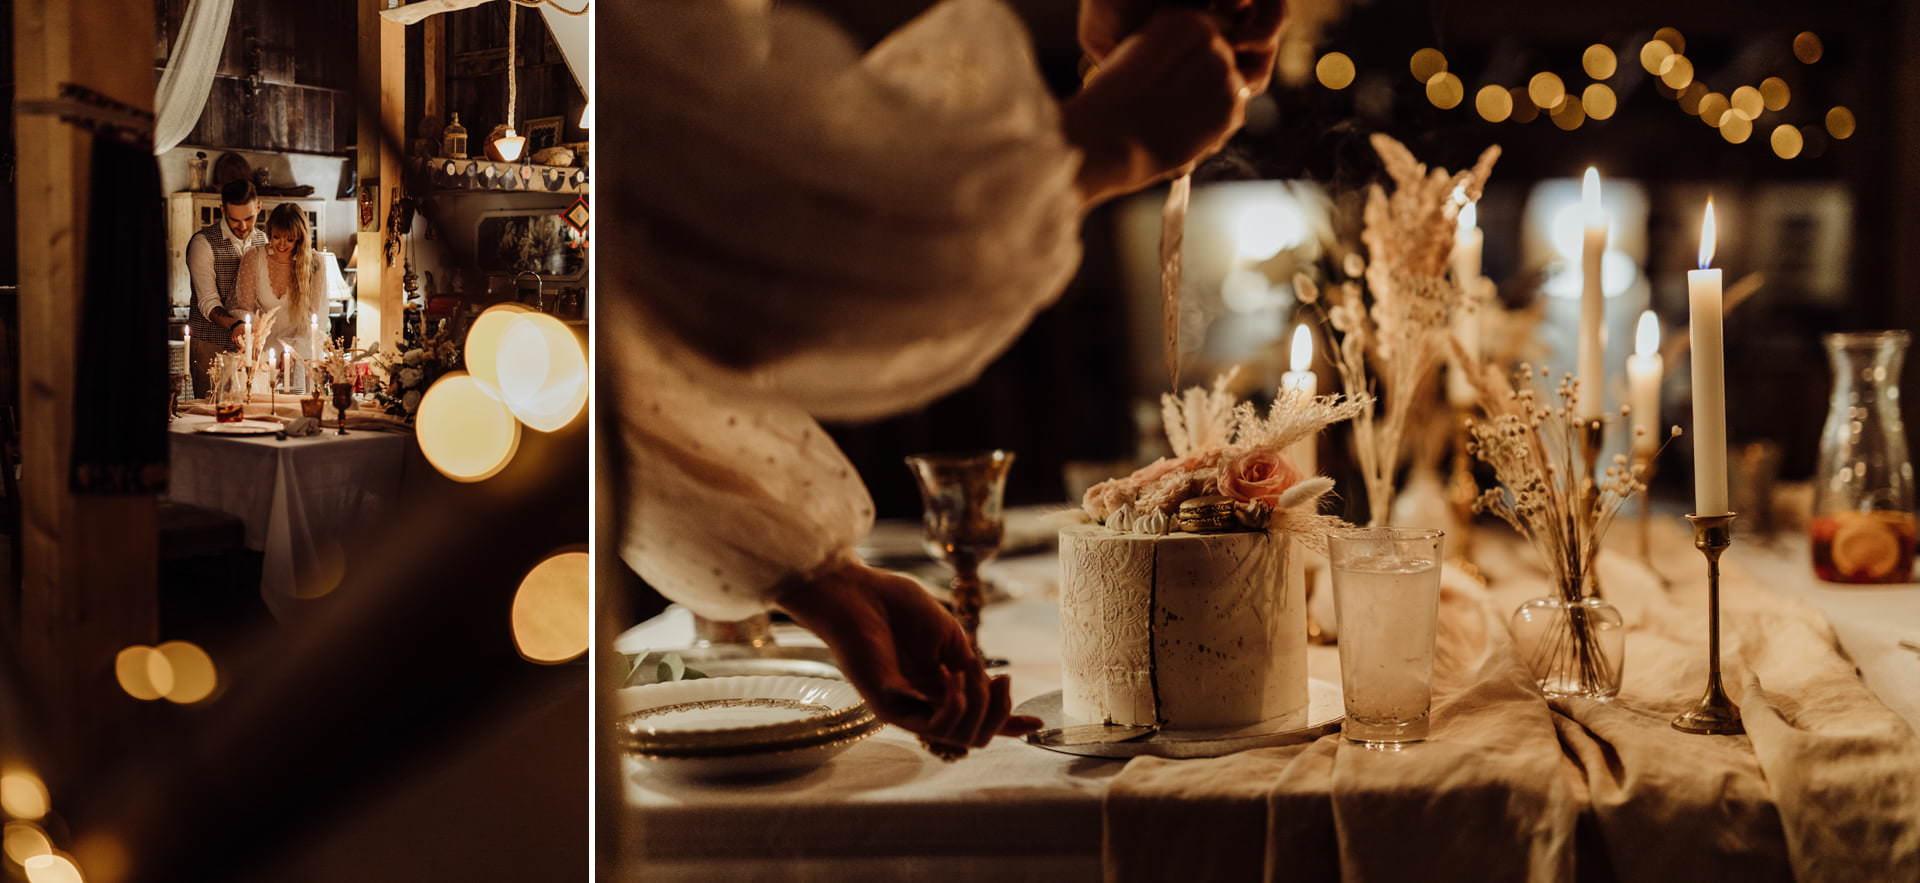 wesele w stodole u jojo